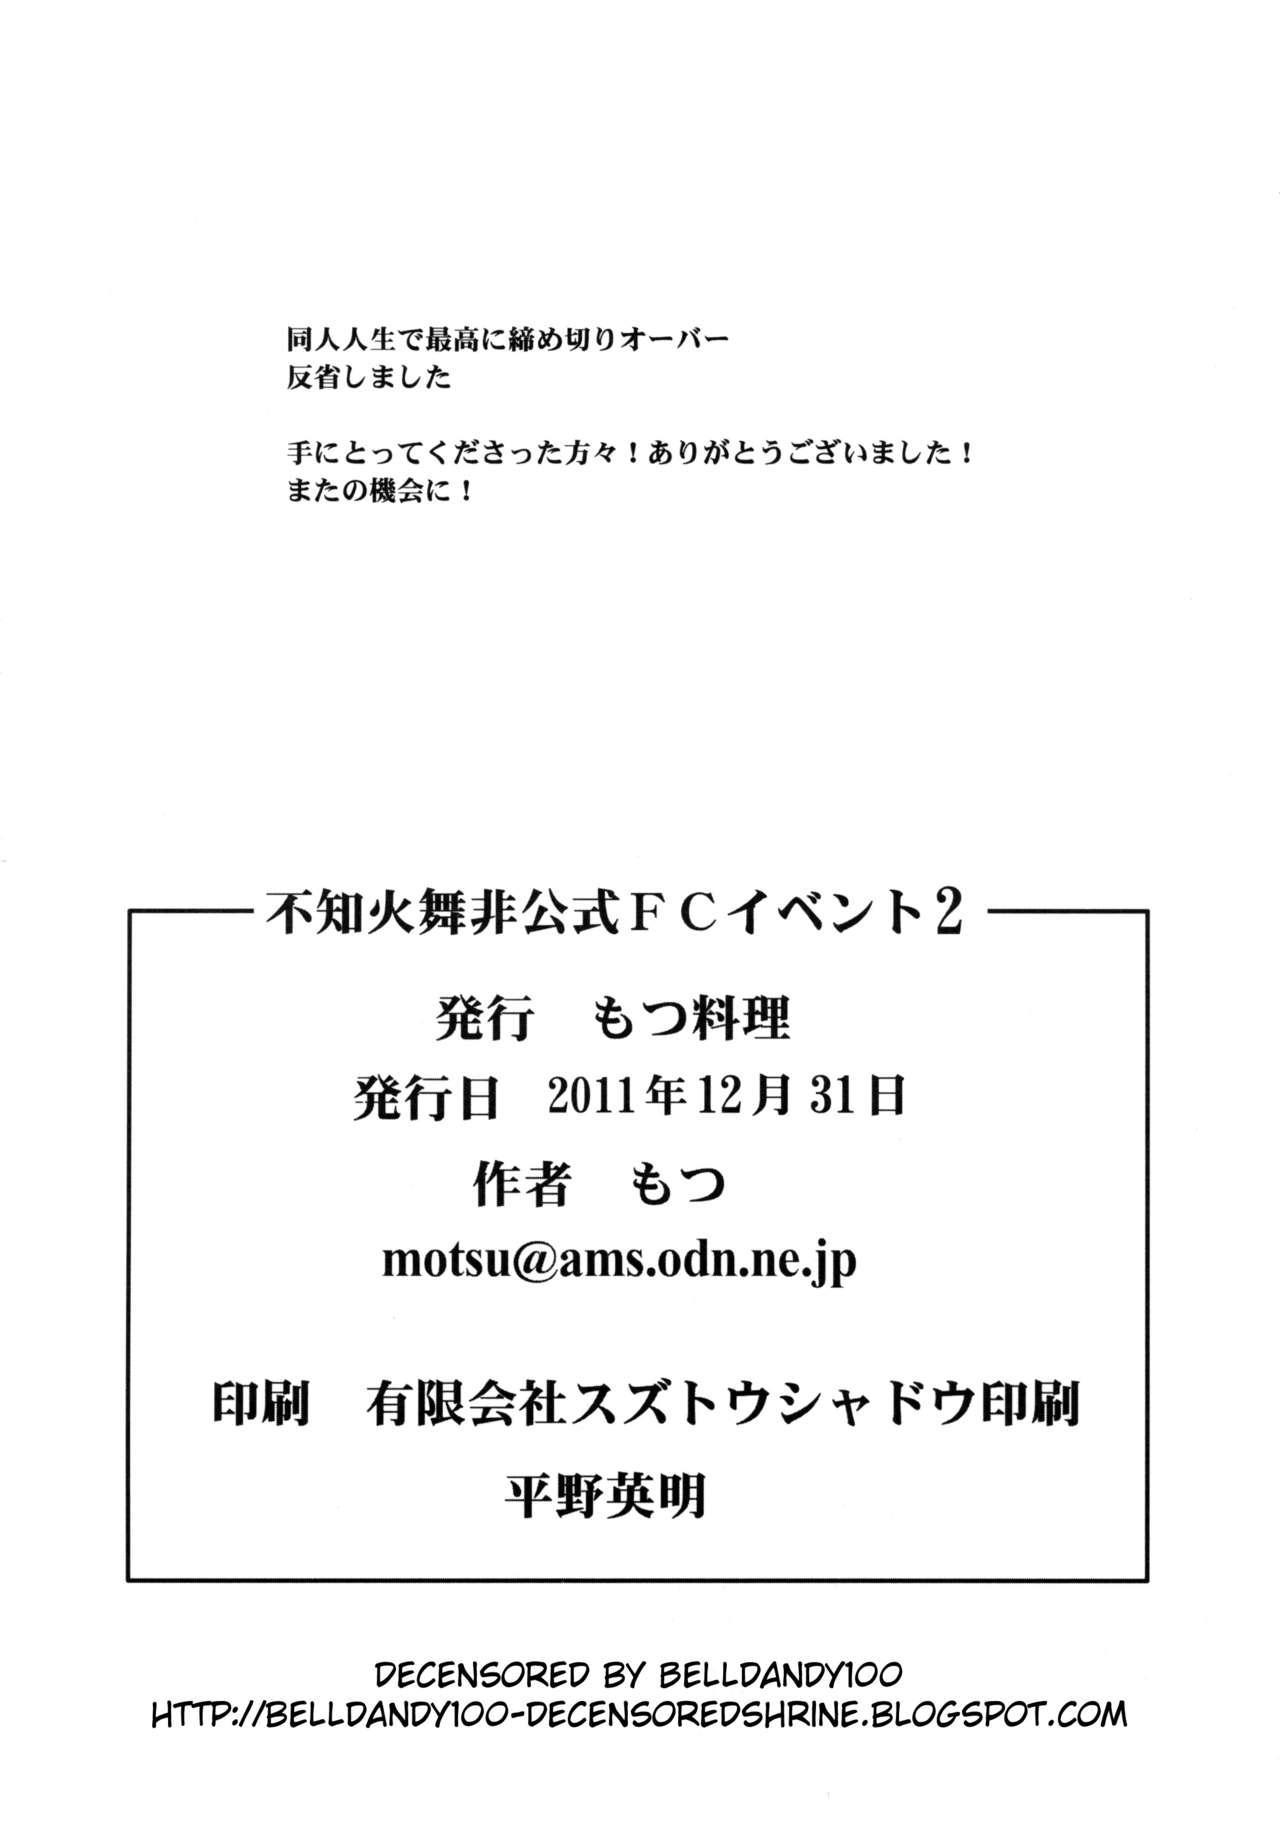 Shiranui Mai Hikoushiki FC Event 2 20